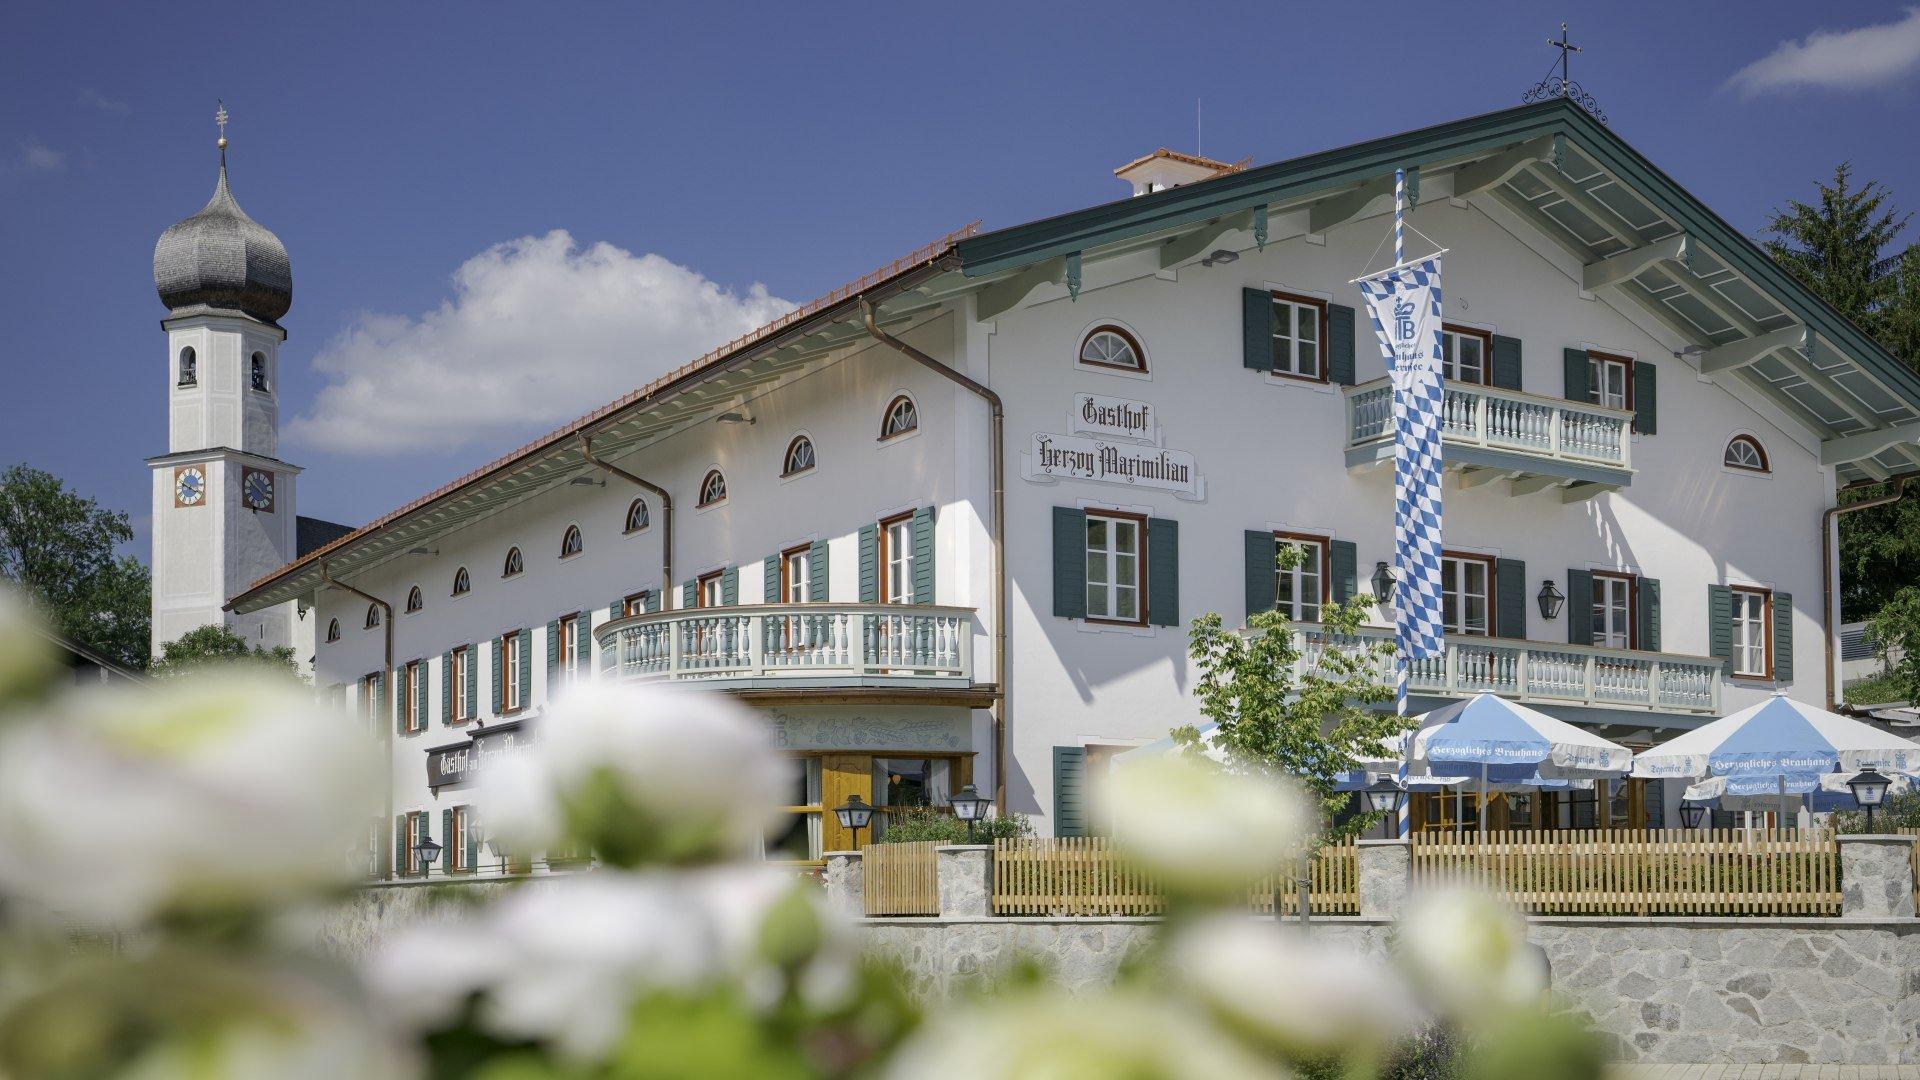 Gasthof Herzog Maximilian, © Der Tegernsee, Foto: Dietmar Denger